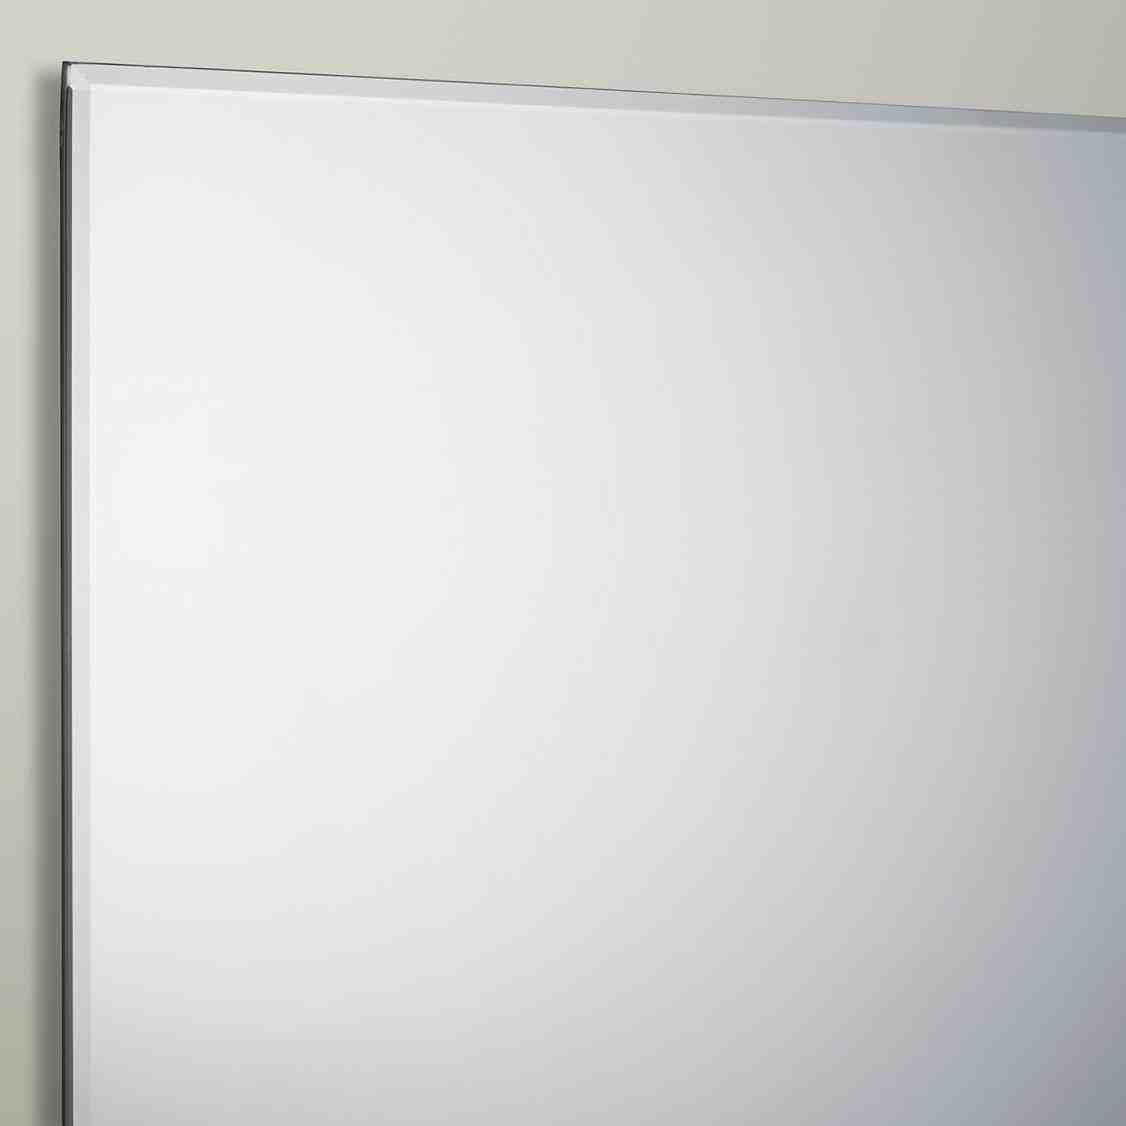 New Post bevelled edge bathroom mirror   LivingRooms   Pinterest ...